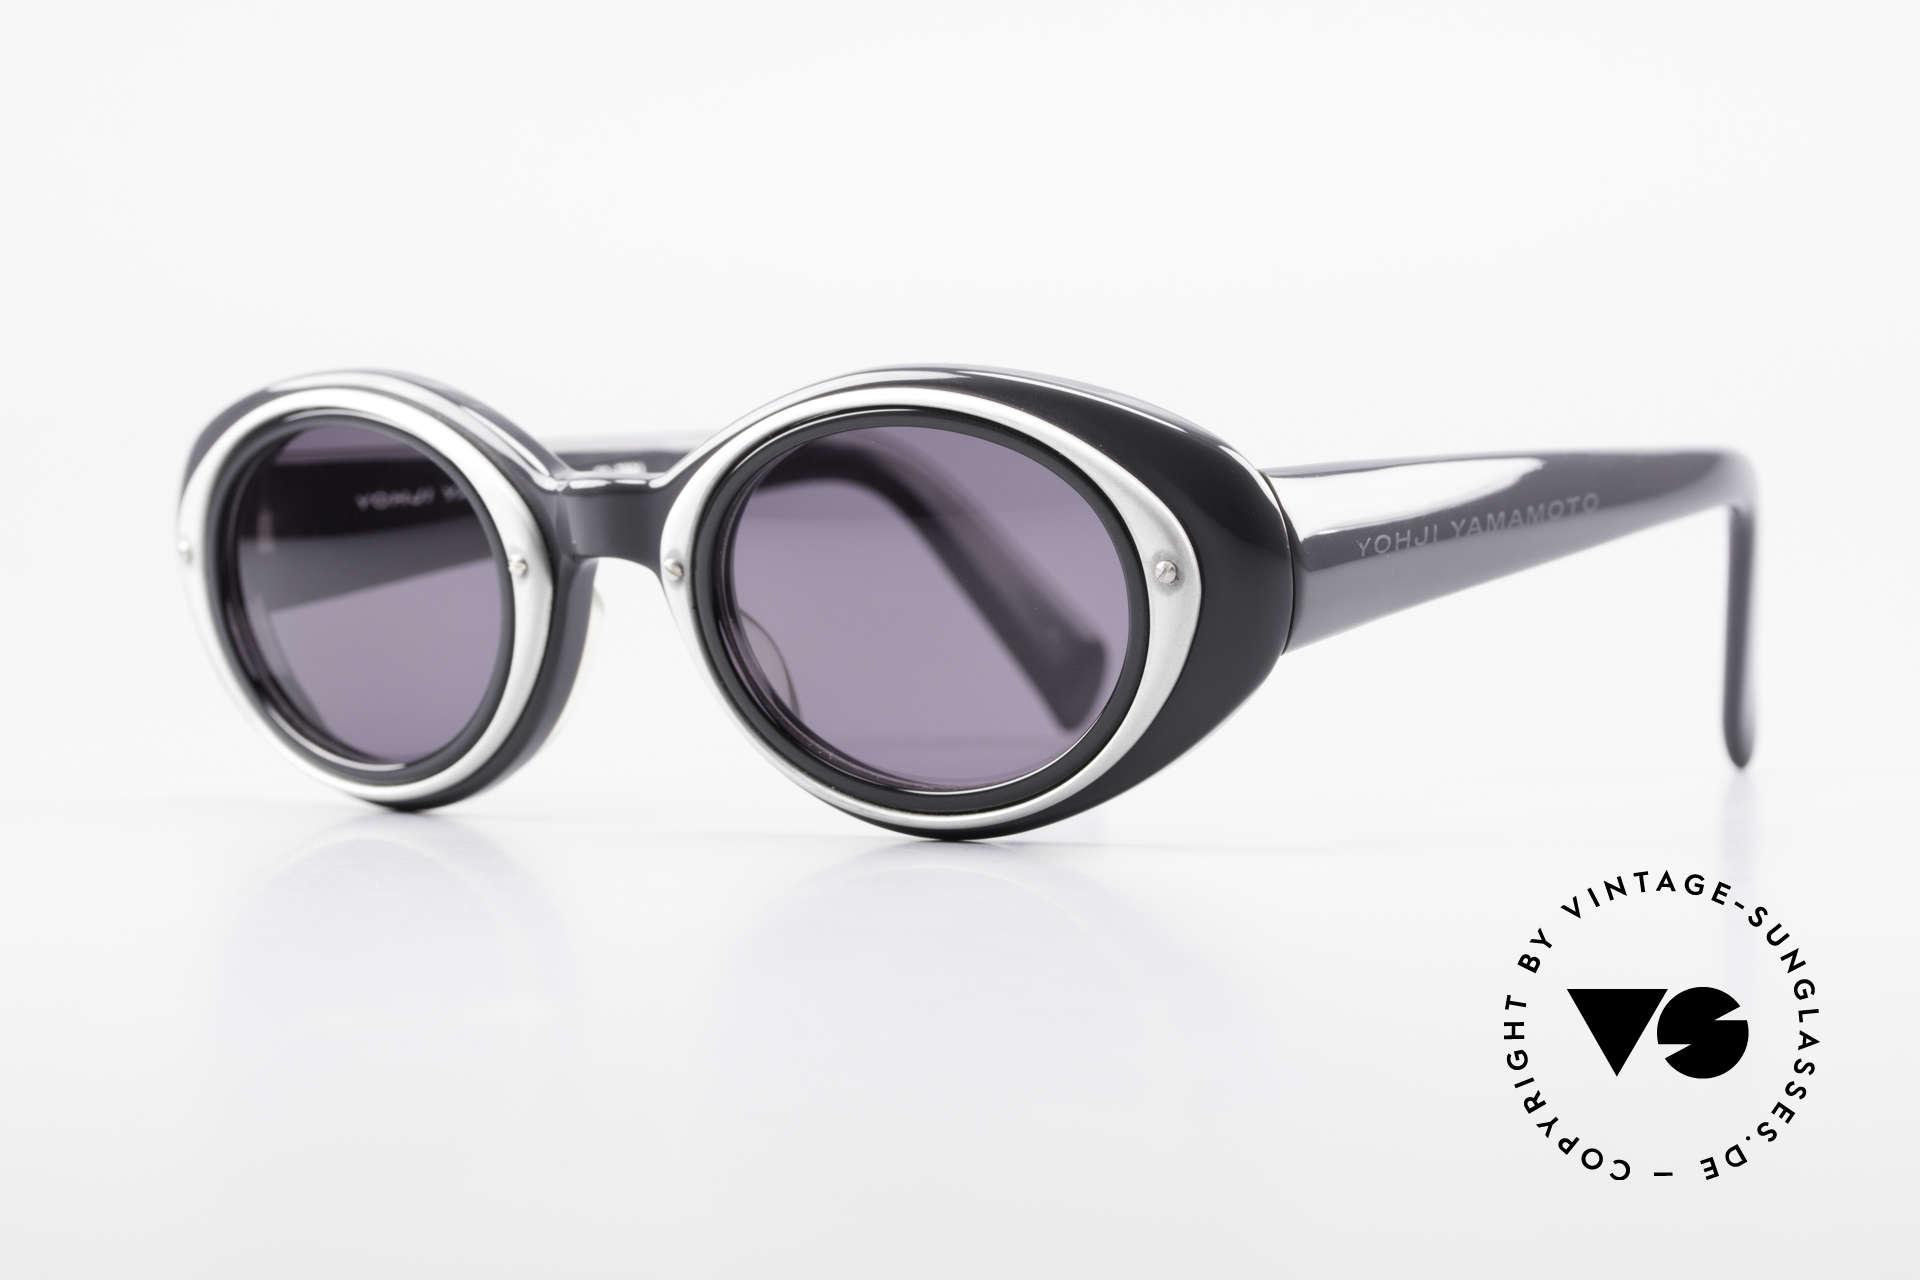 Yohji Yamamoto 52-7001 Sunglasses Kurt Cobrain Style, dark gray plastic frame with silver ornamental cover, Made for Men and Women